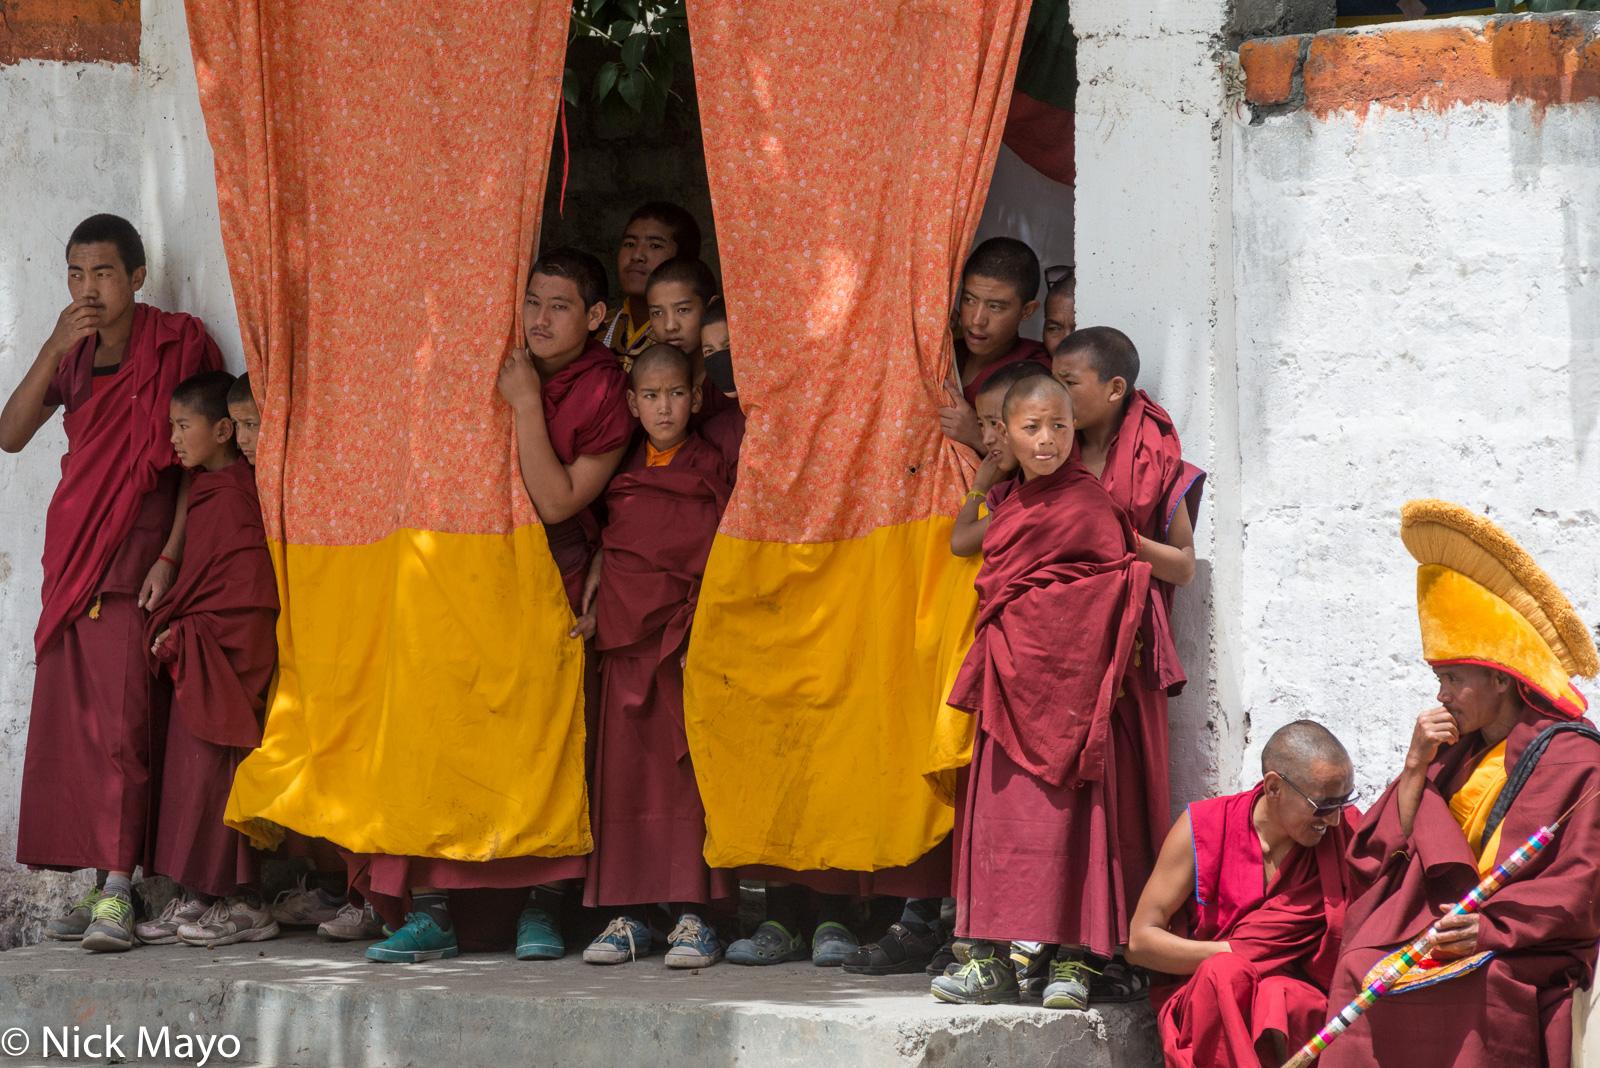 Festival,Himachal Pradesh, India, Monk, photo